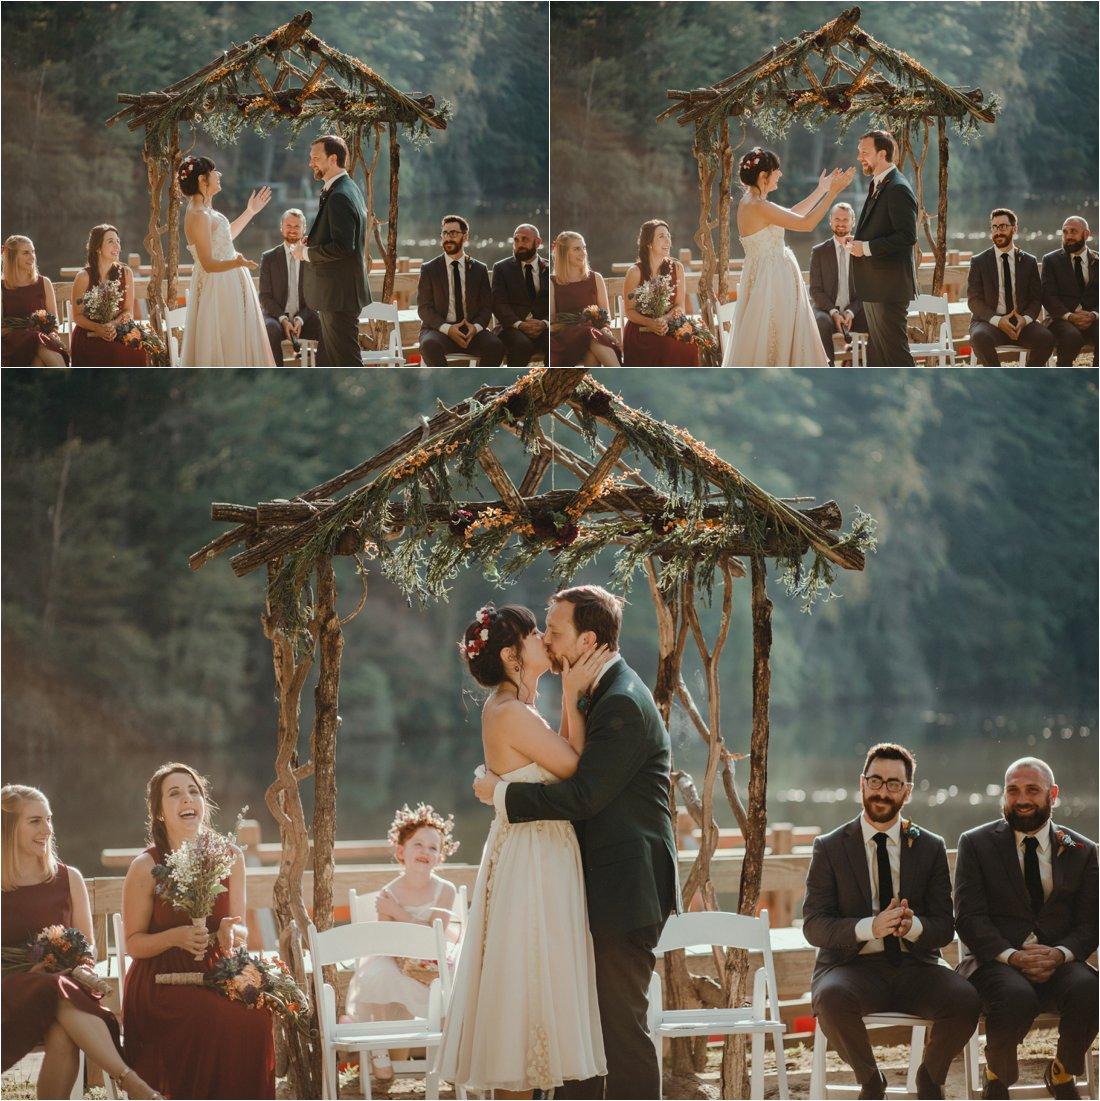 echo-oscar-camp-pinnacle-asheville-hendersonville-nc-wedding_0020.jpg